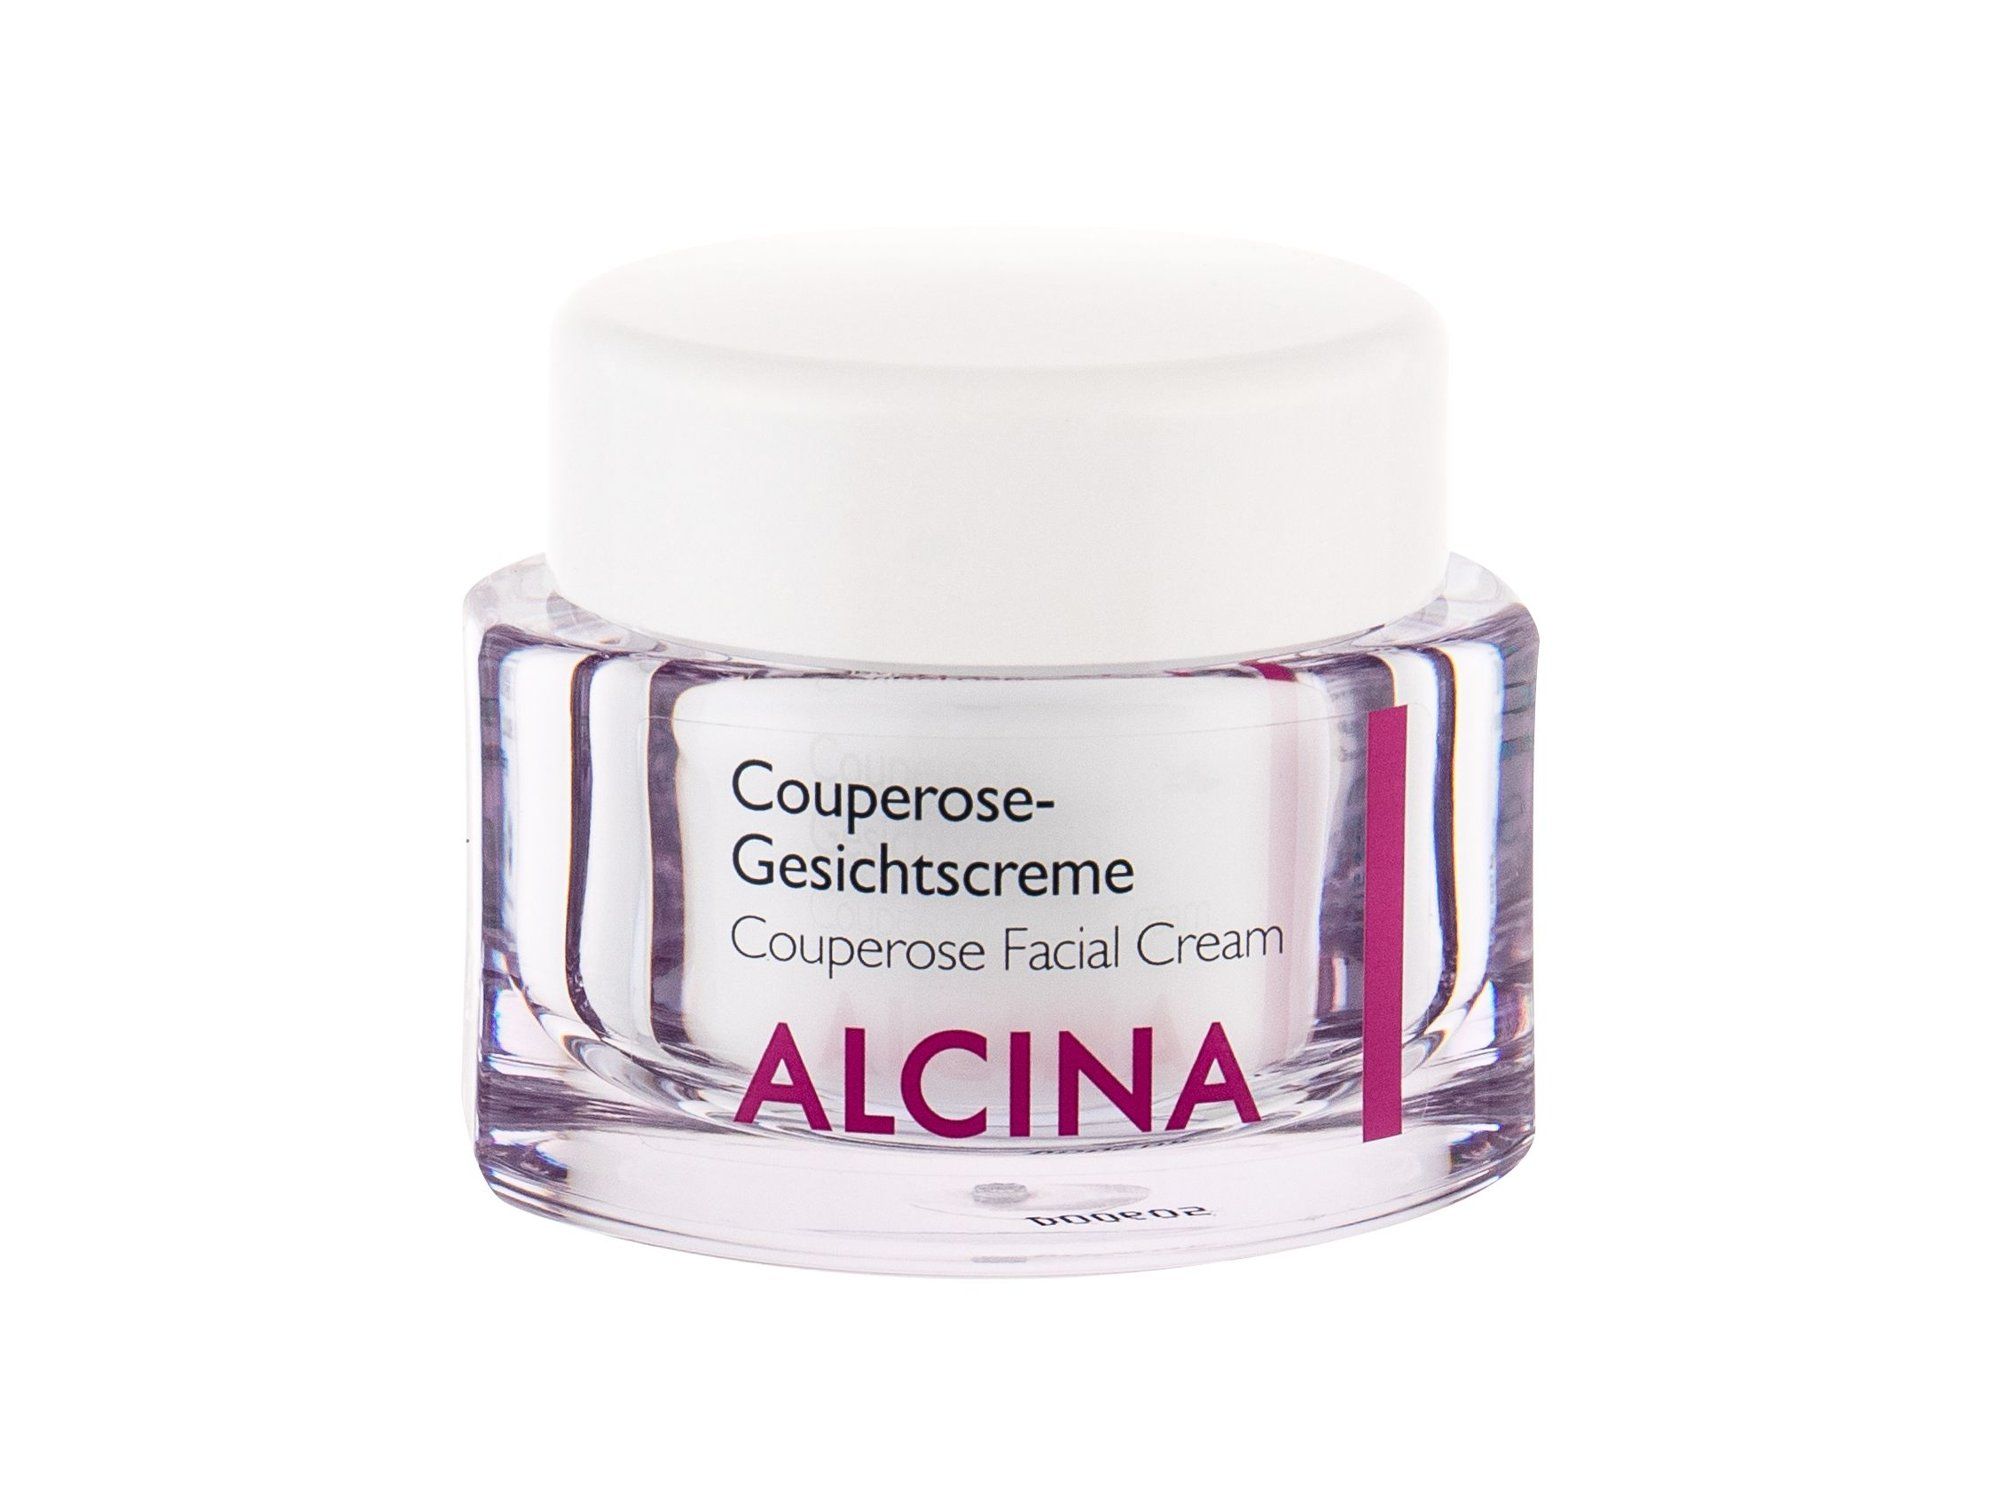 ALCINA Couperose Day Cream 50ml